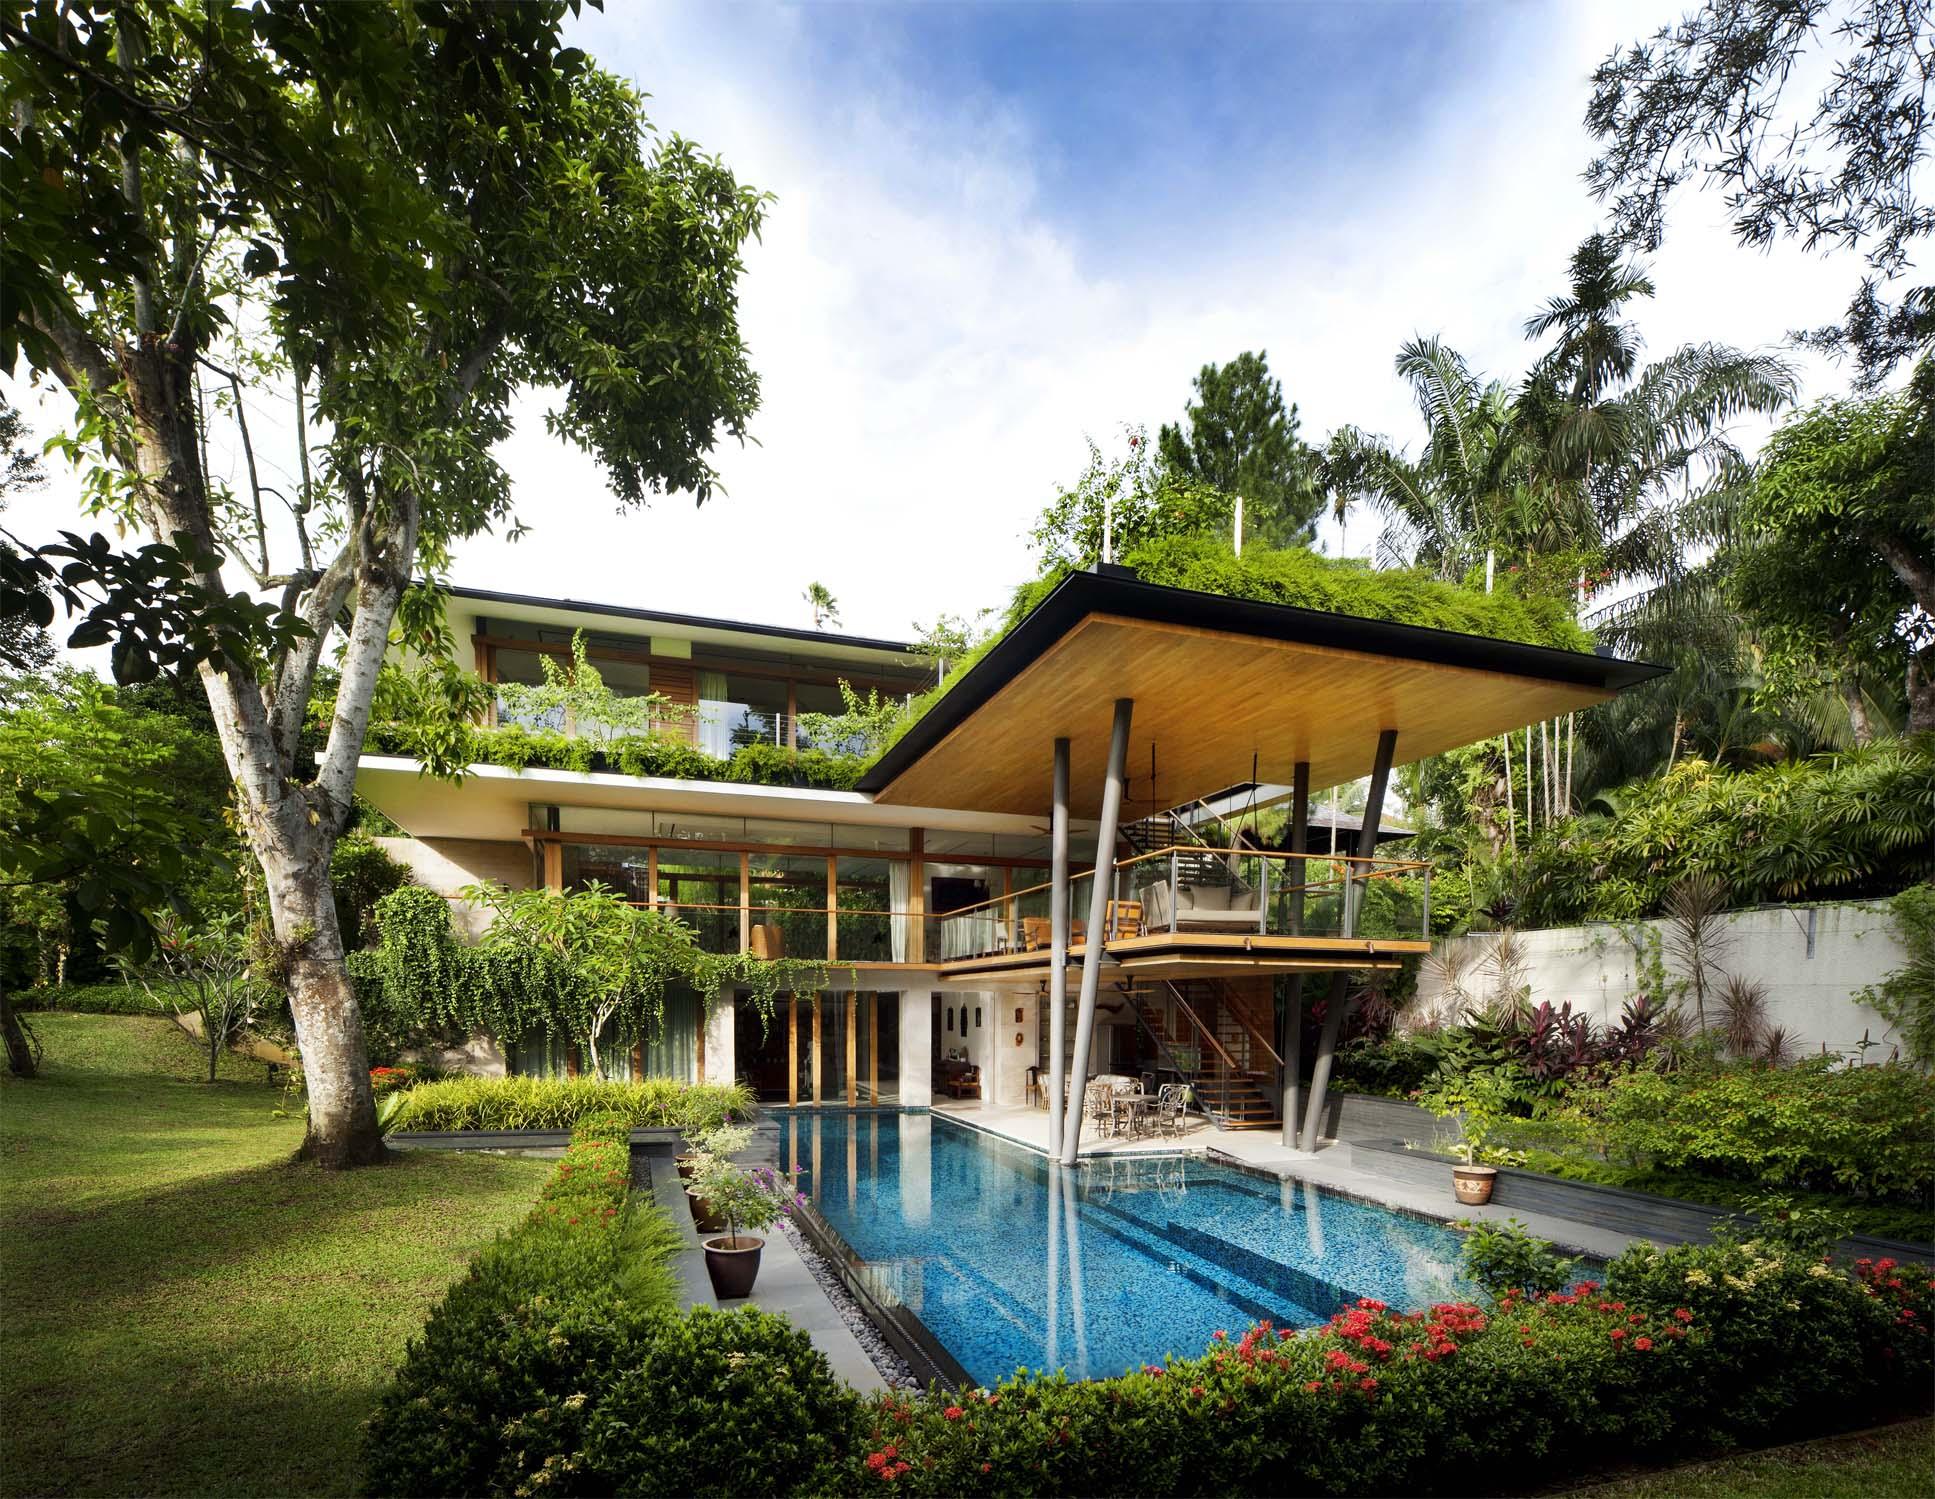 singapore-architect-firm-jalan-sampurna-house-1